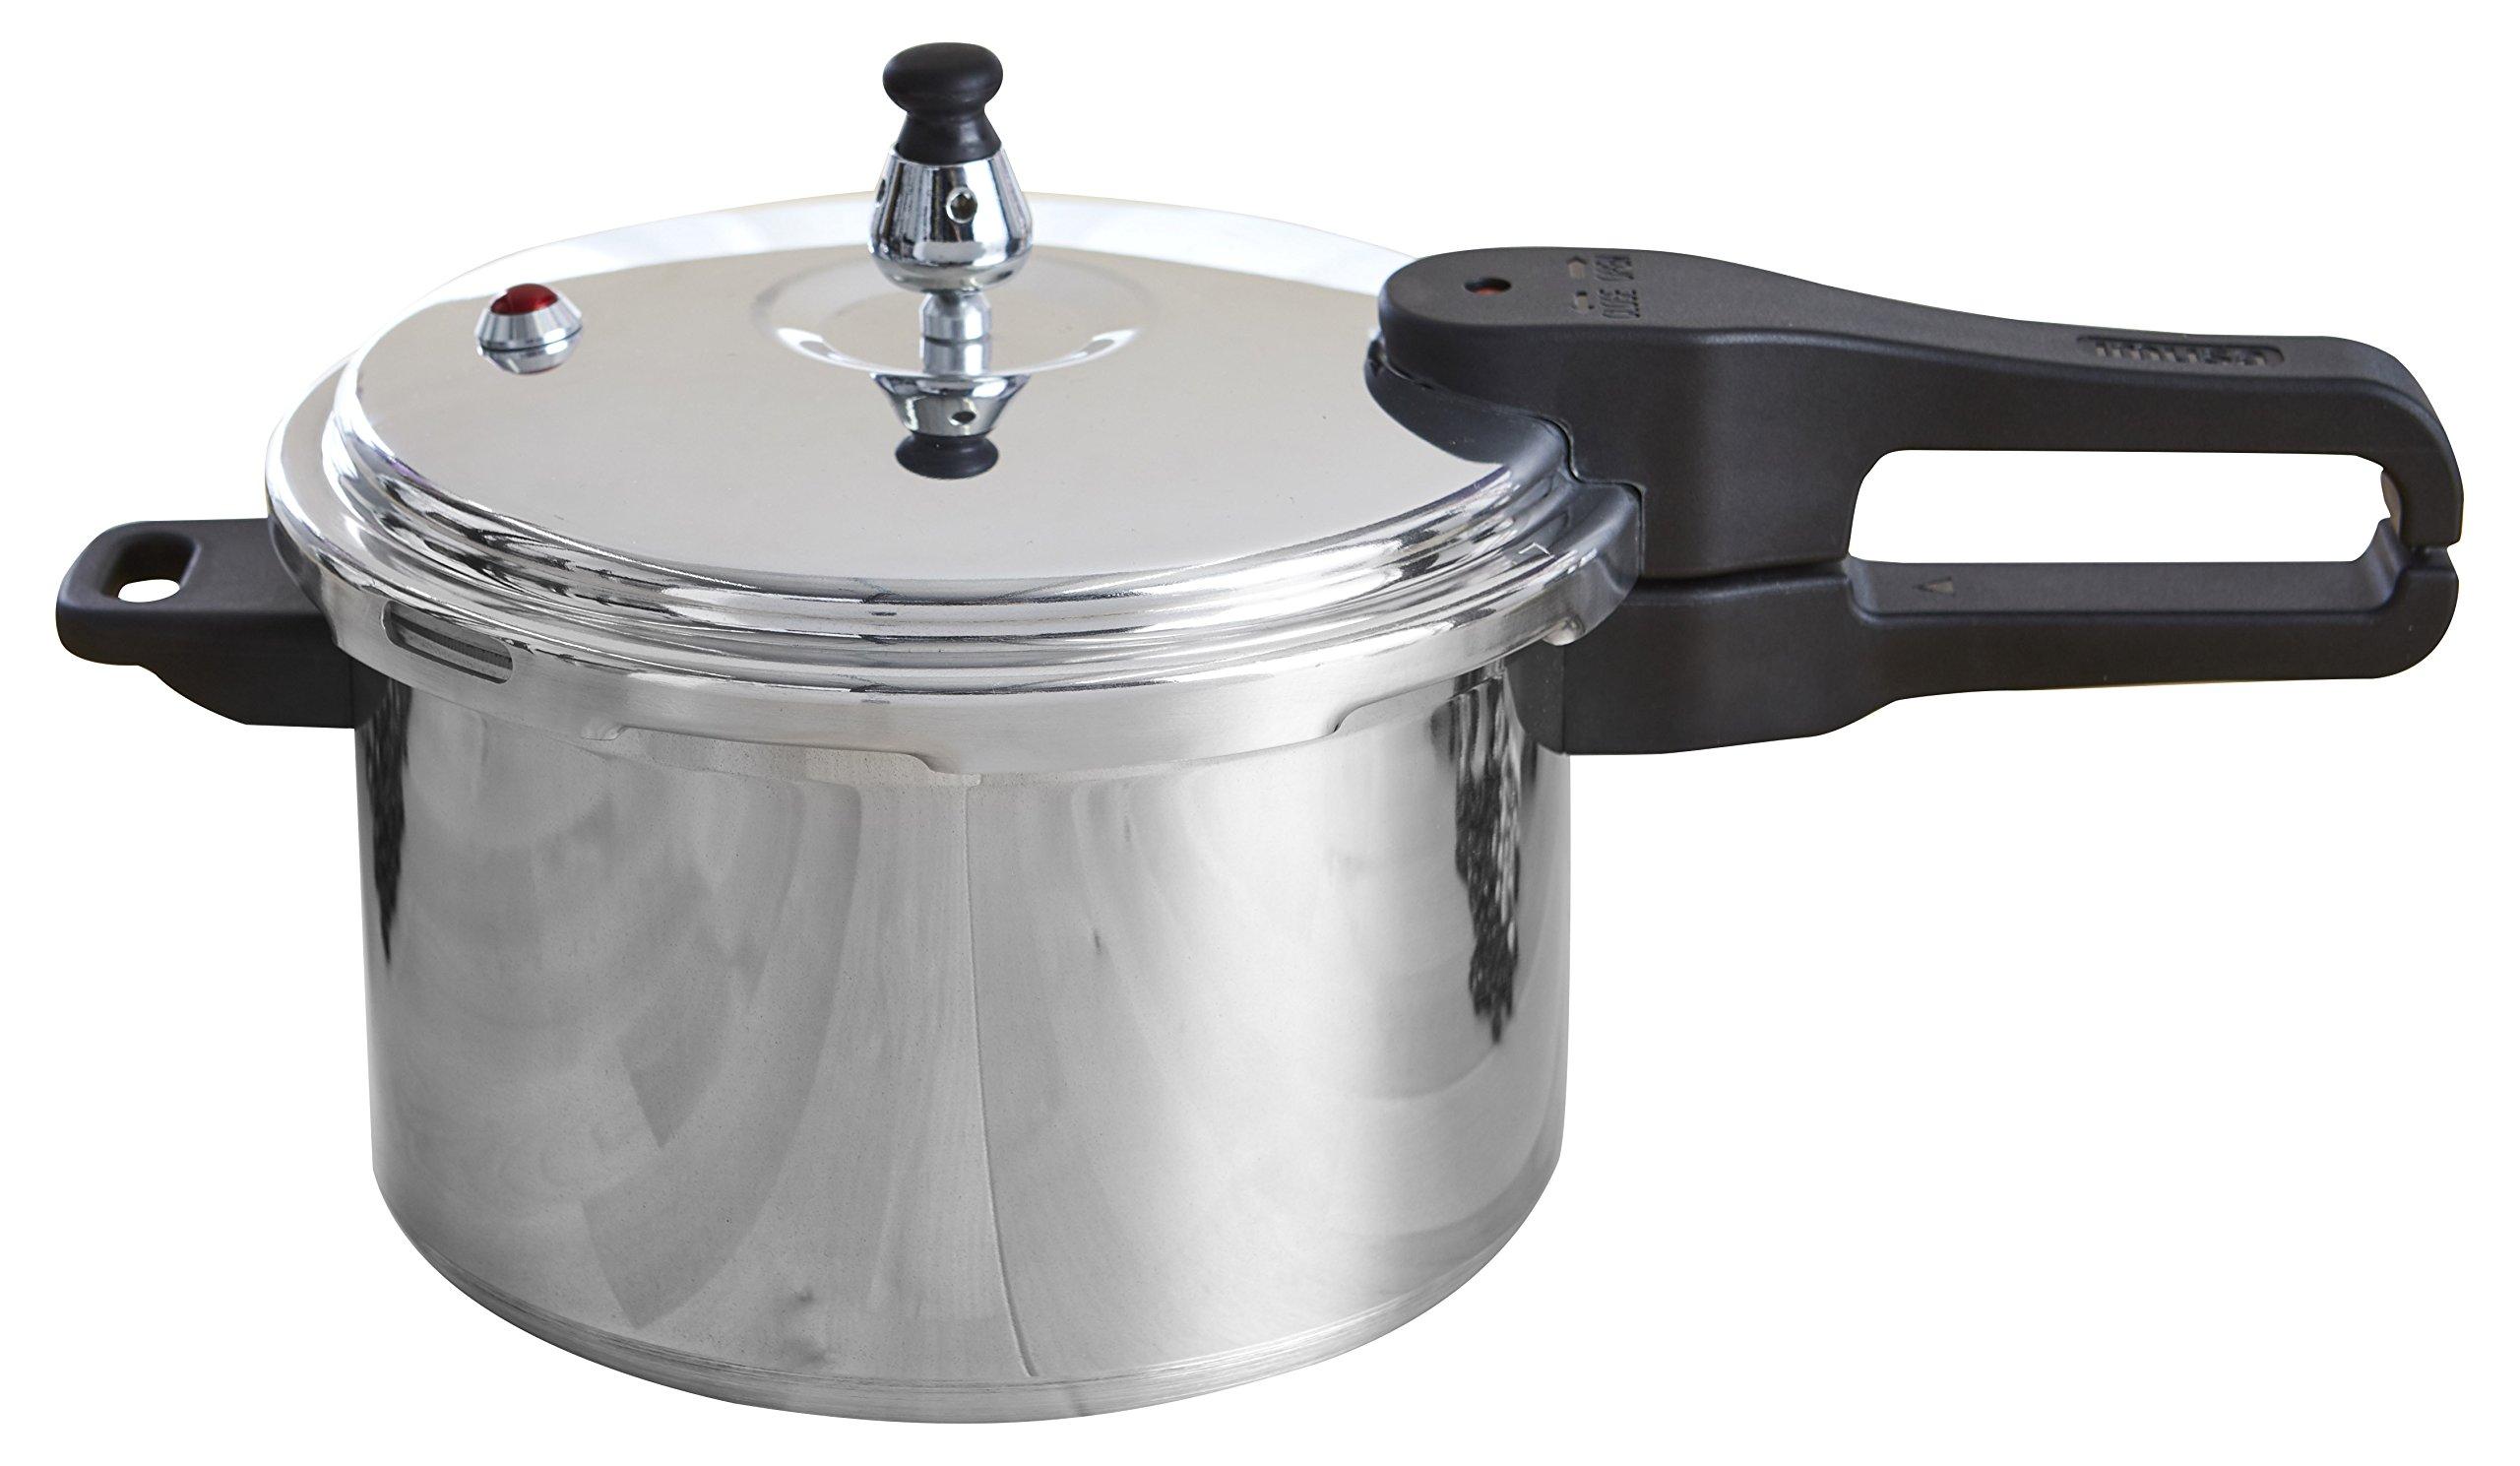 IMUSA USA A417-80801W Stovetop Aluminum Pressure Cooker 7.2-Quart,Silver